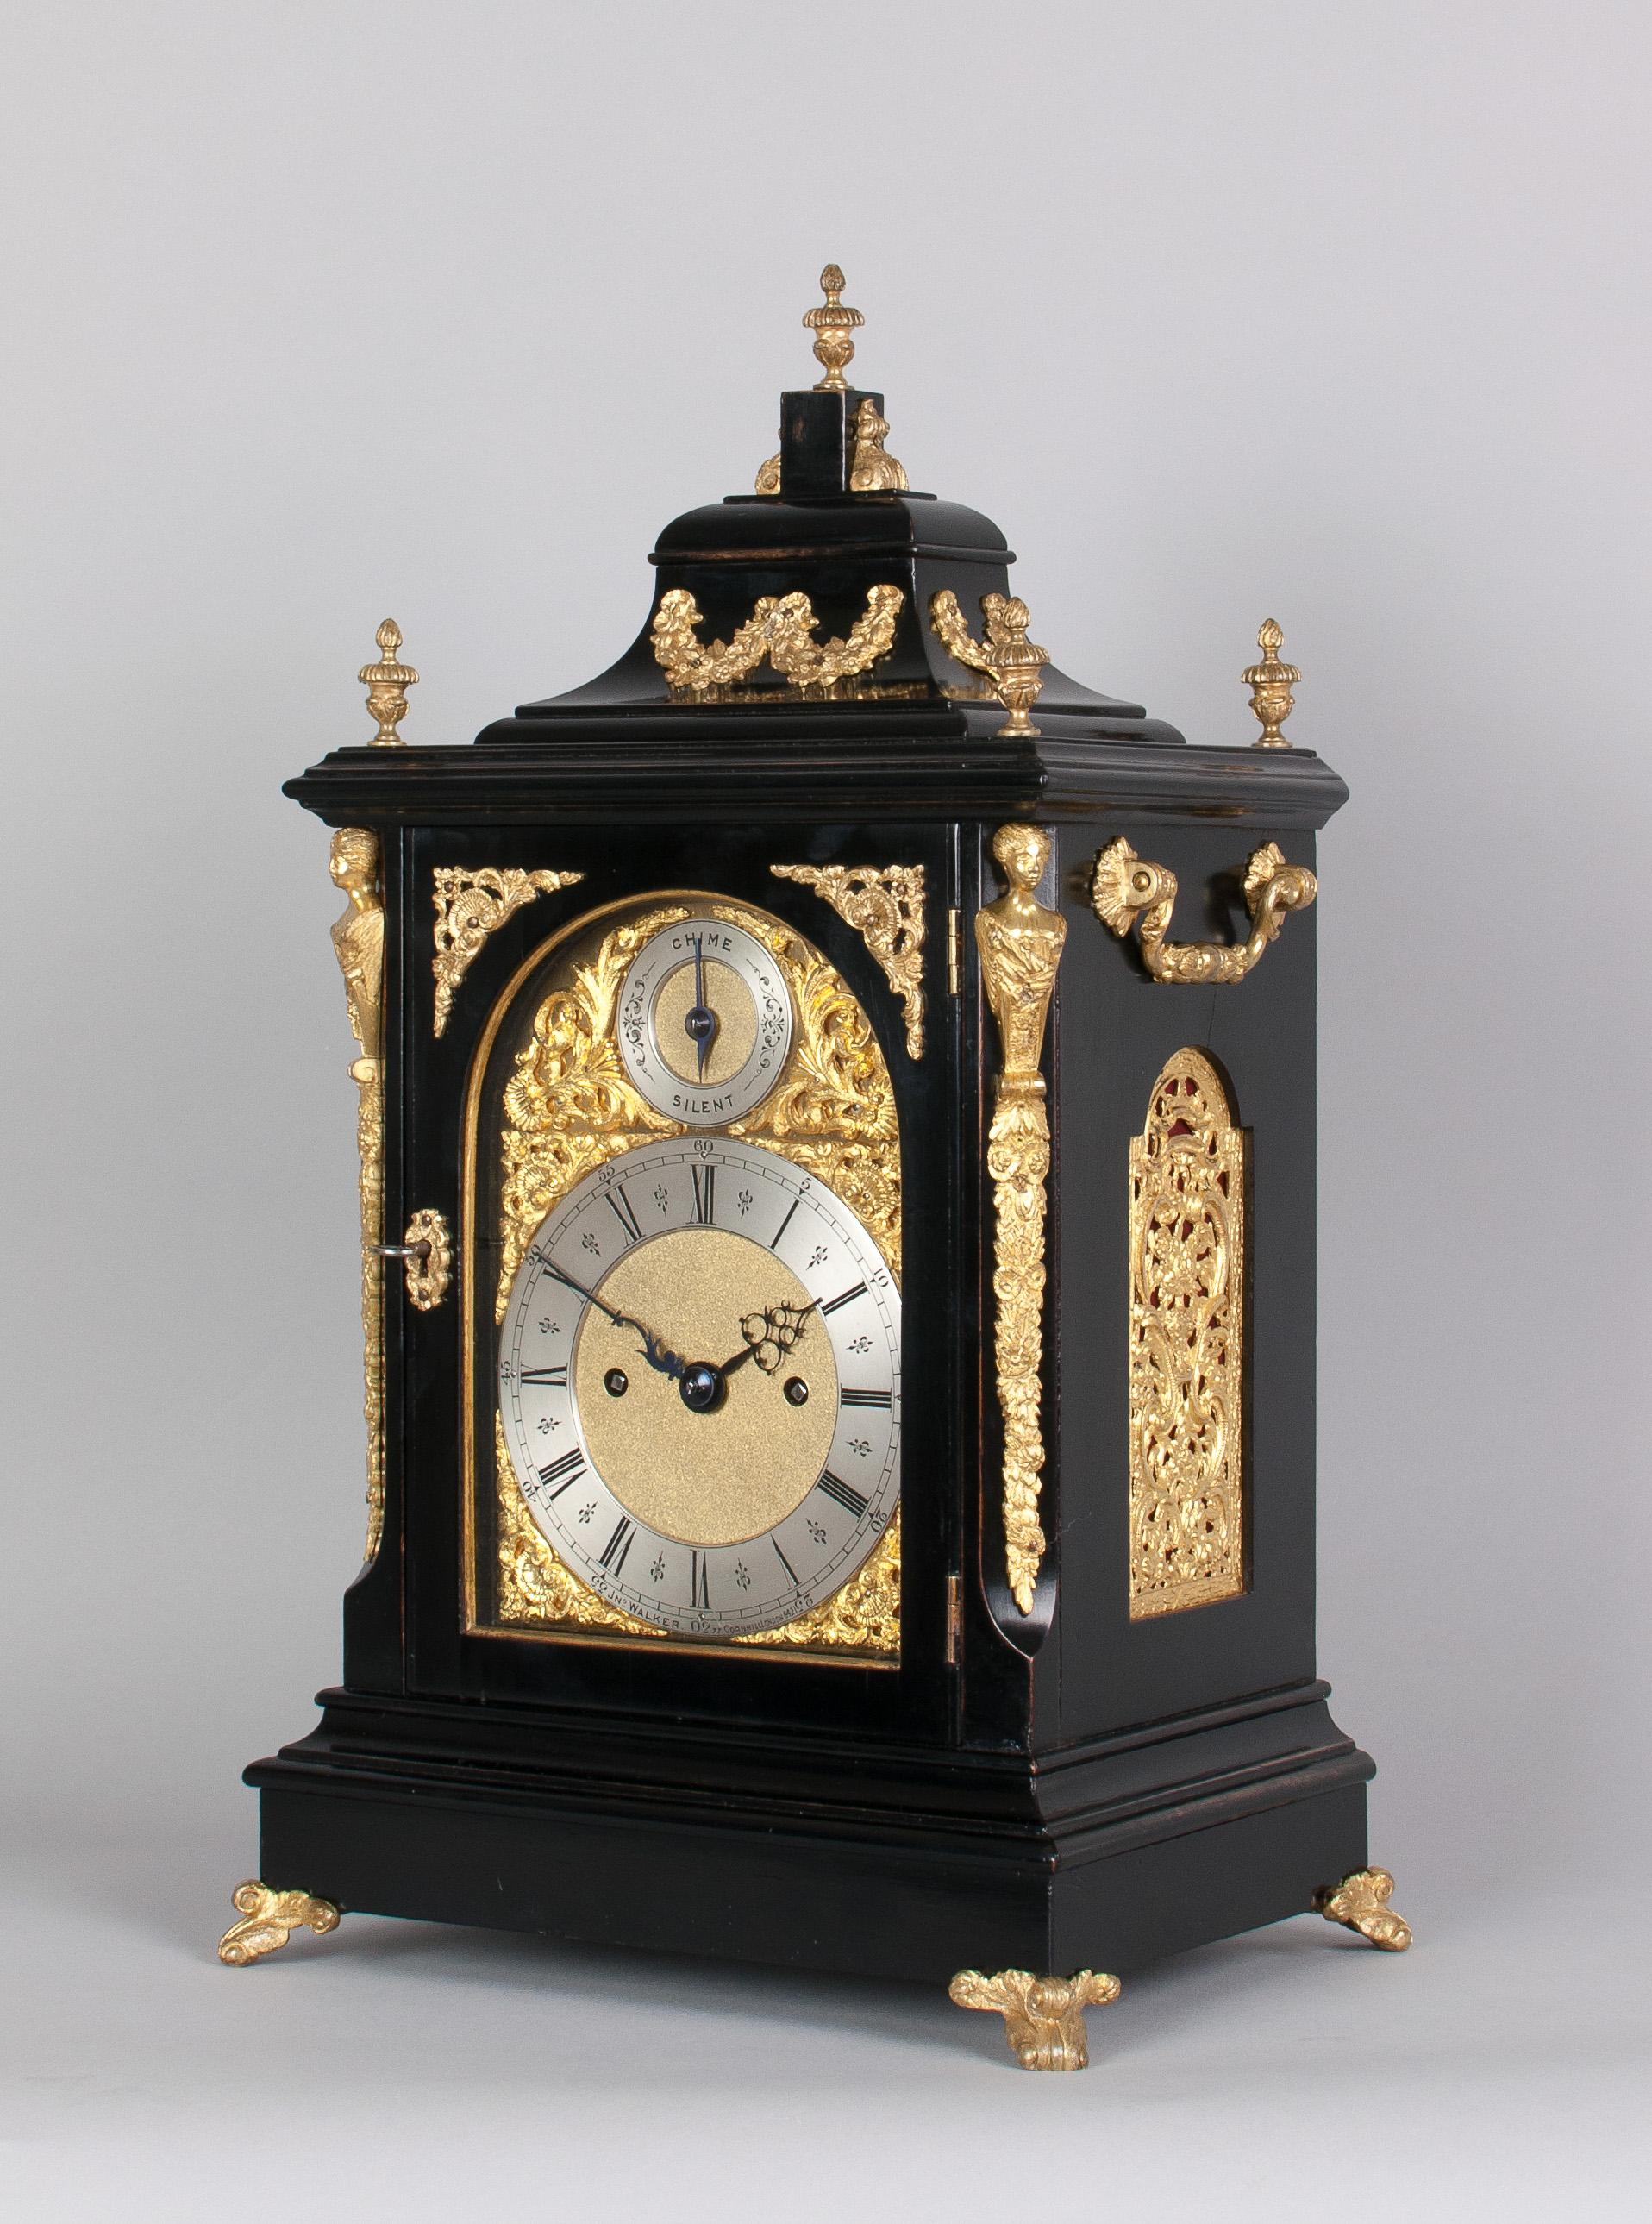 Story Antique Clocks image (9 of 11)